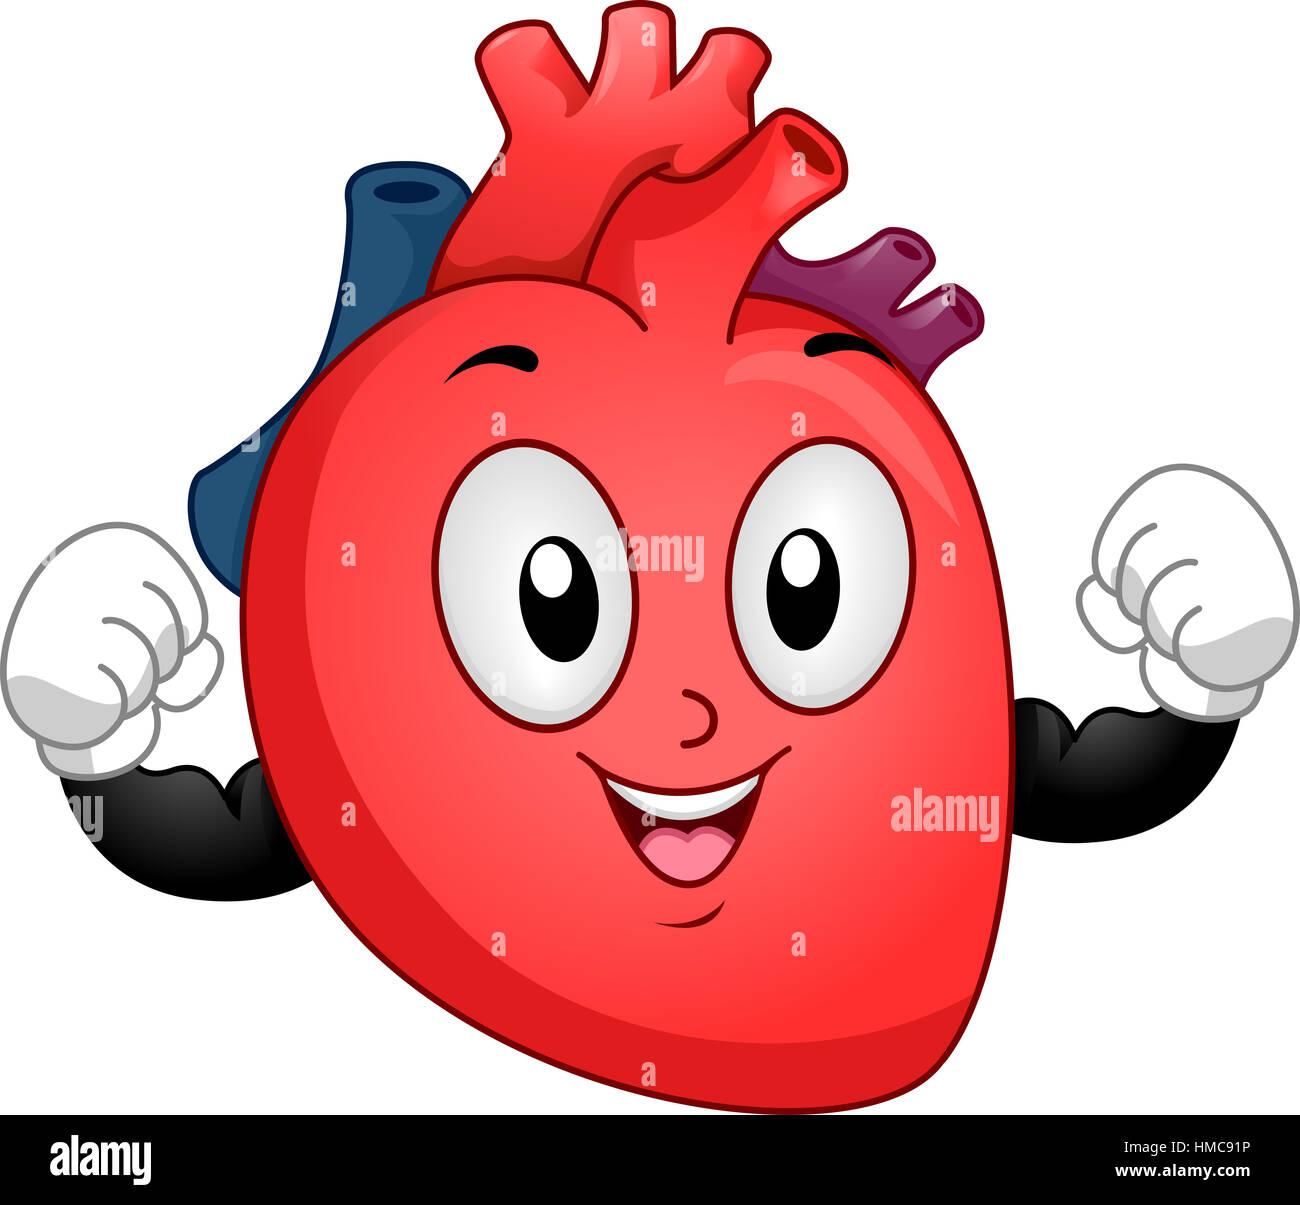 Mascot Illustration of a Healthy Human Heart Flexing its ...